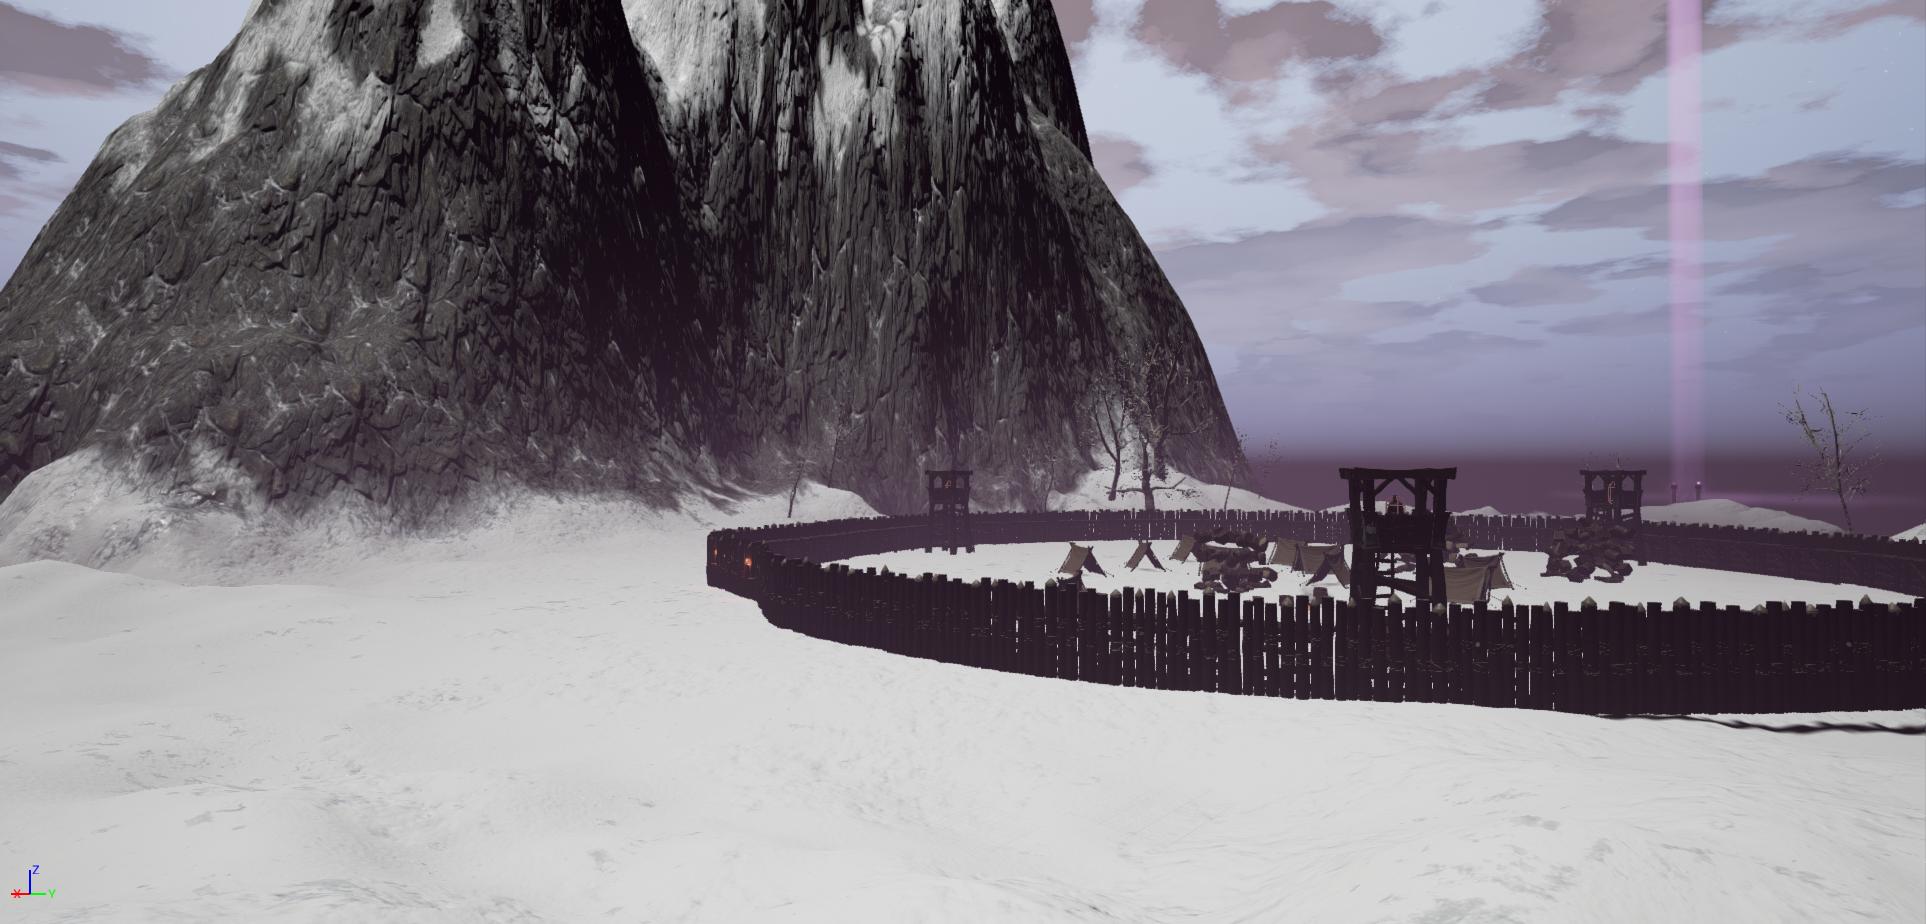 Snowy landscape in the game Fictorum